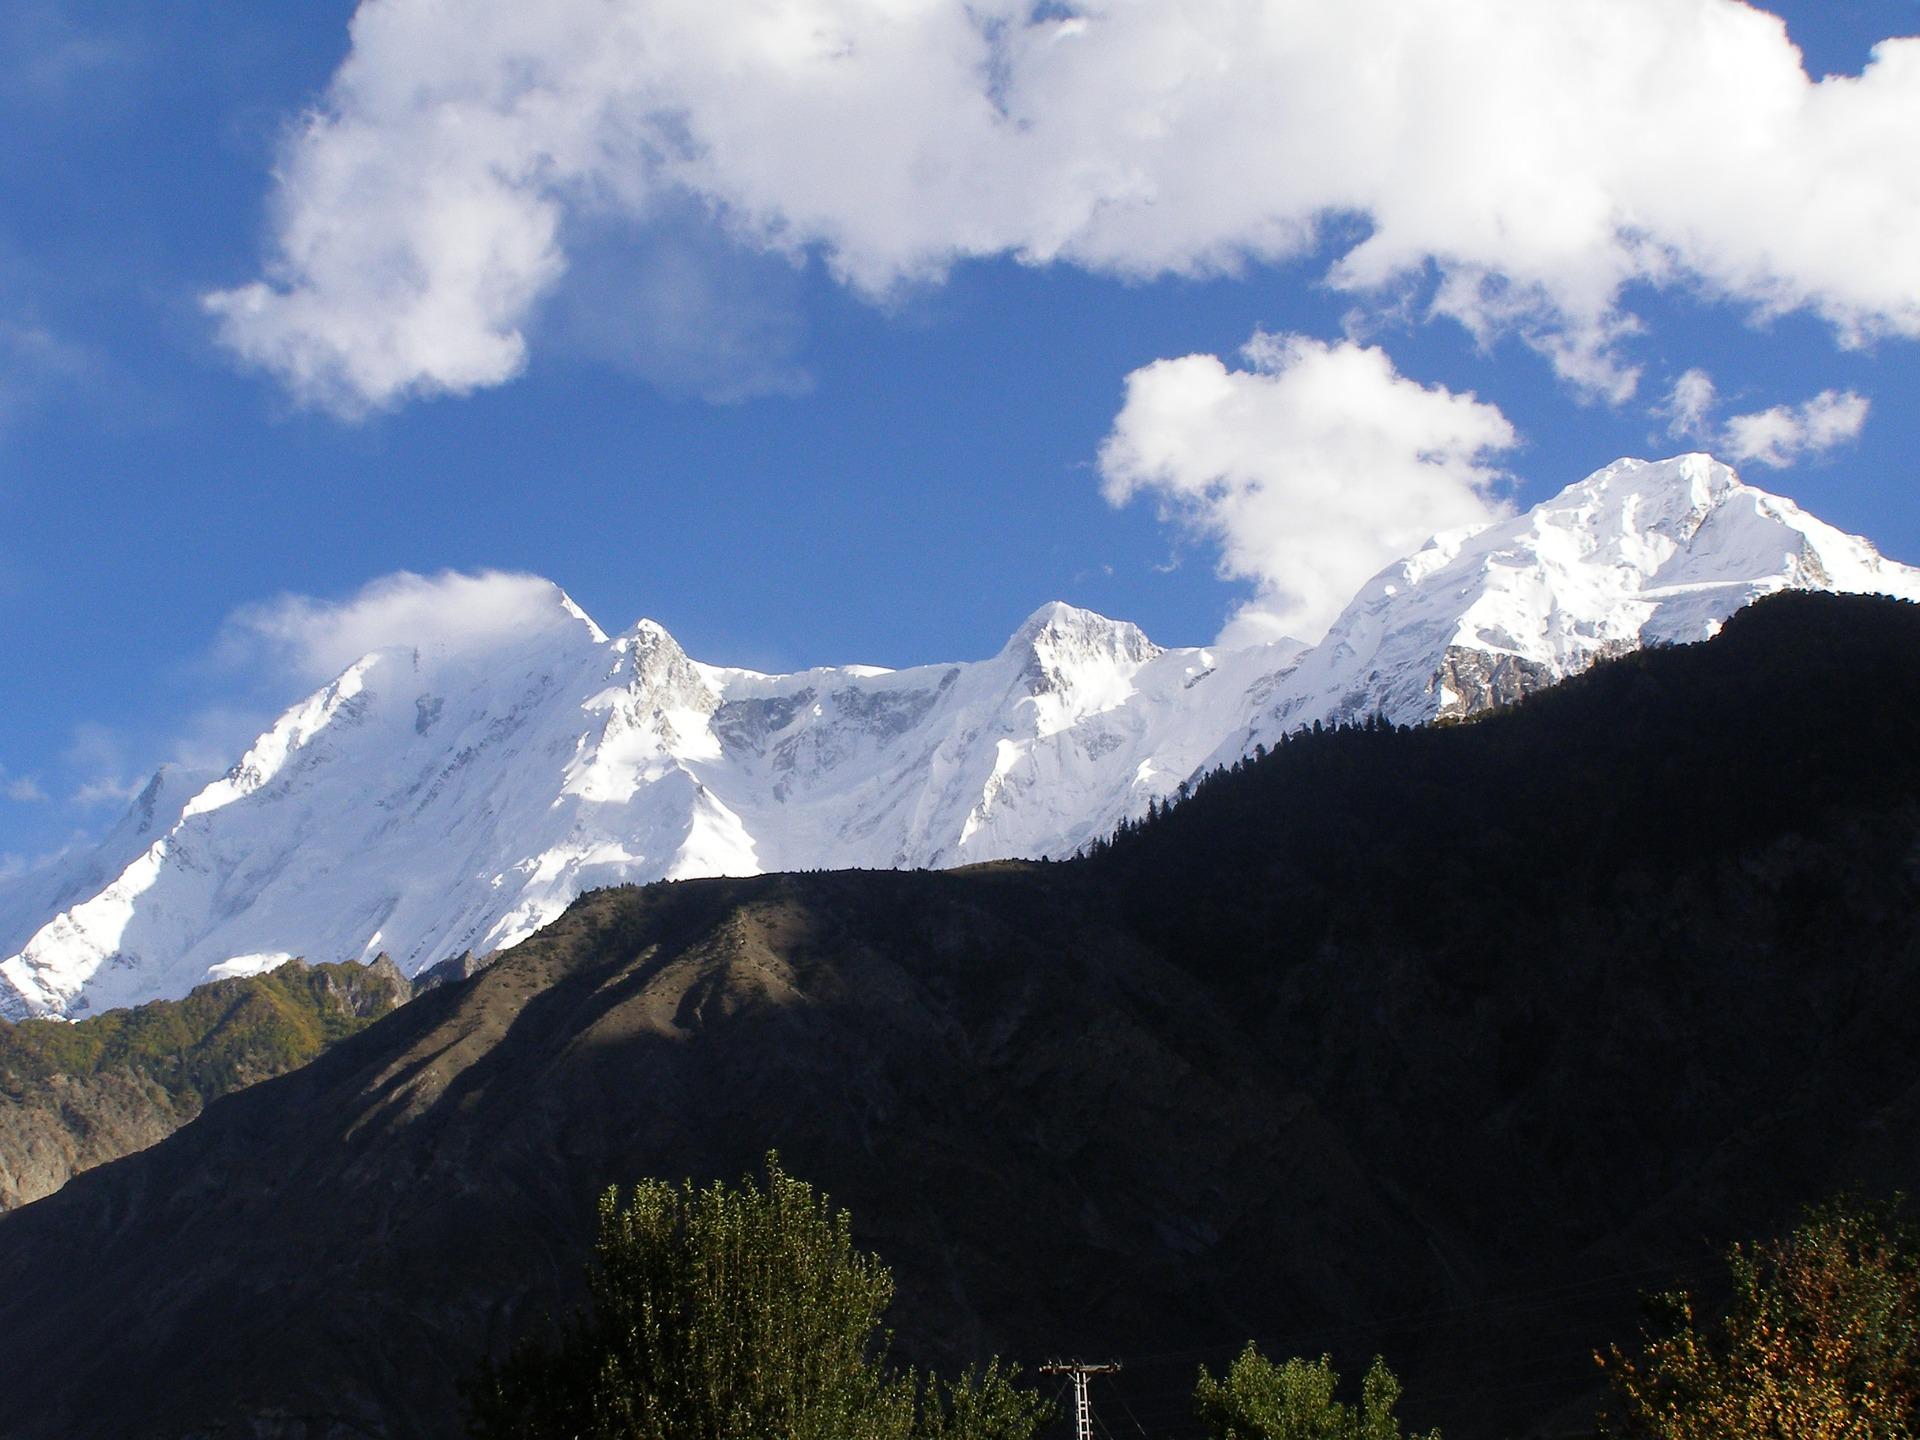 Wyprawa na Broad Peak – Monika Witkowska XIX